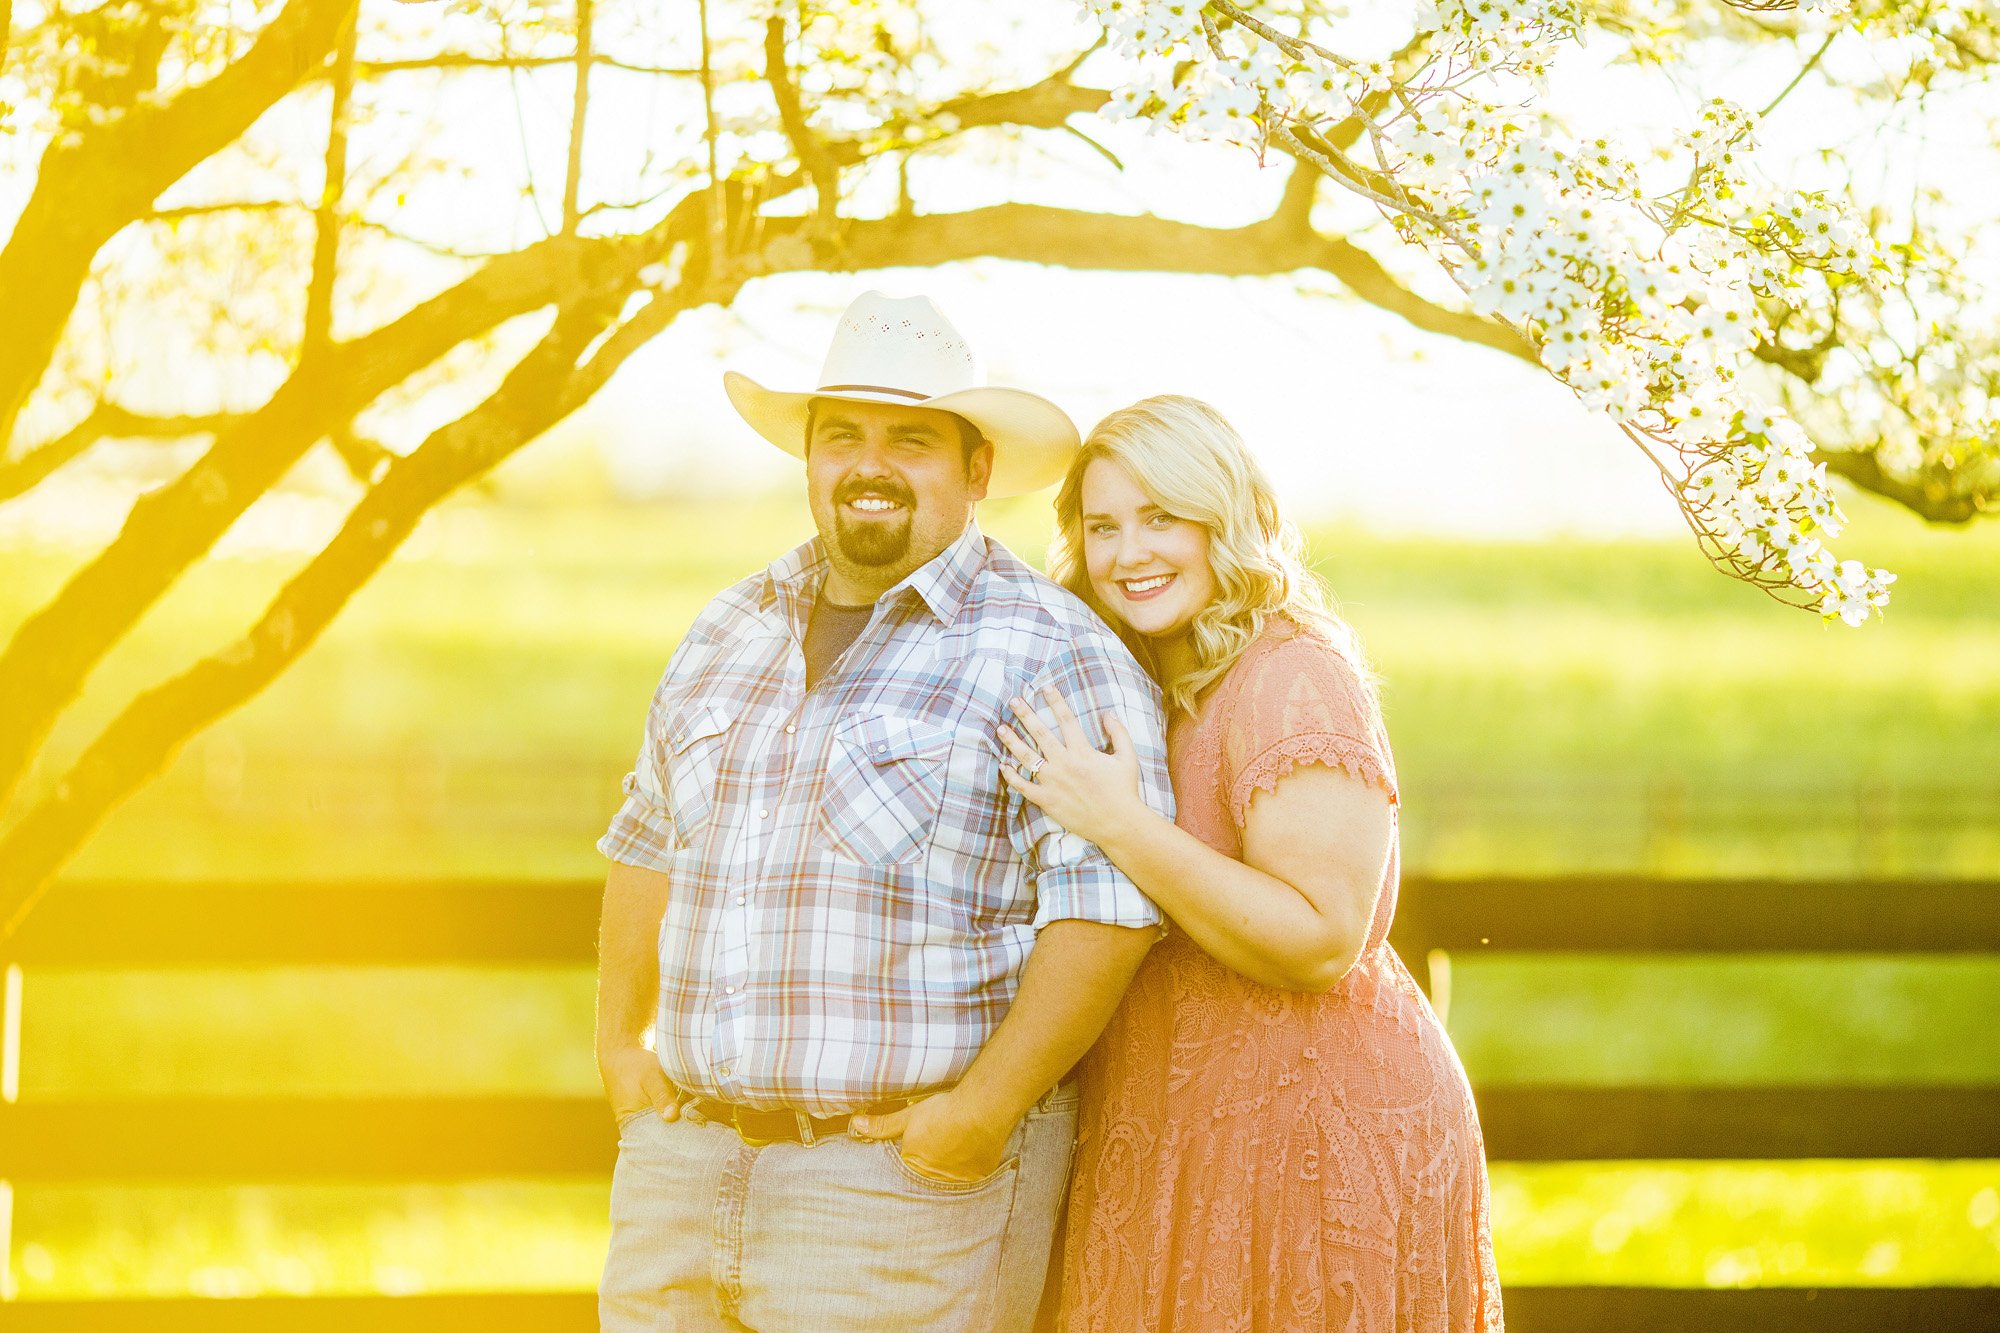 Seriously_Sabrina_Photography_Lexington_Kentucky_Sunset_Farm_Engagement_Cody_Sara_1.jpg